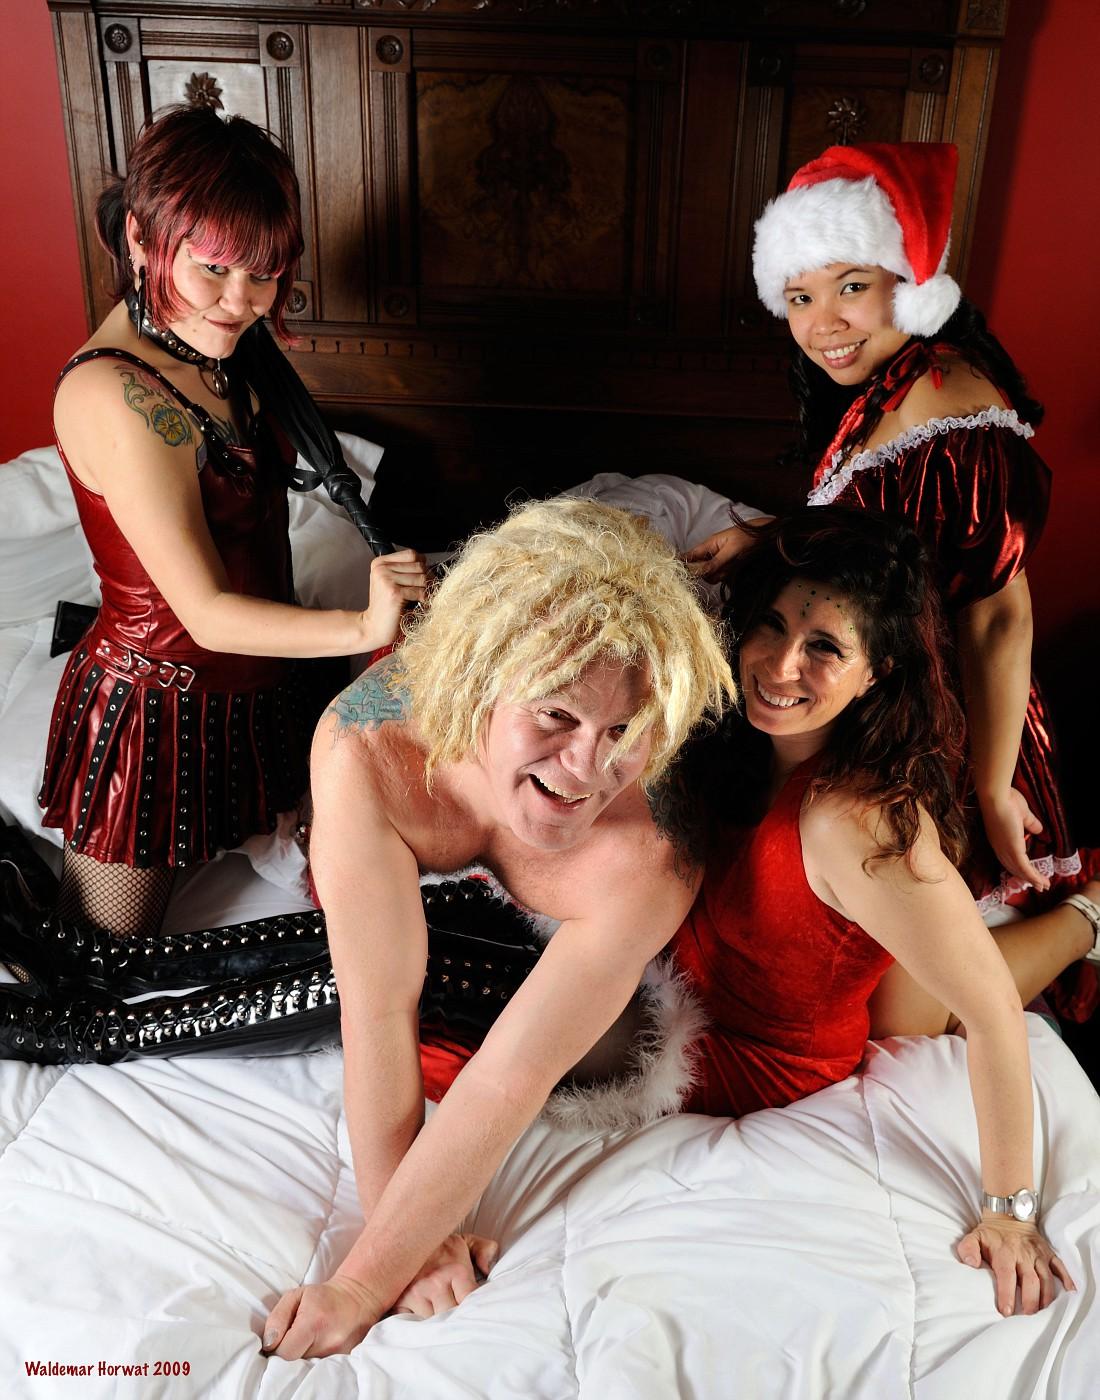 Melody, Warrior, Melanie, and Grace